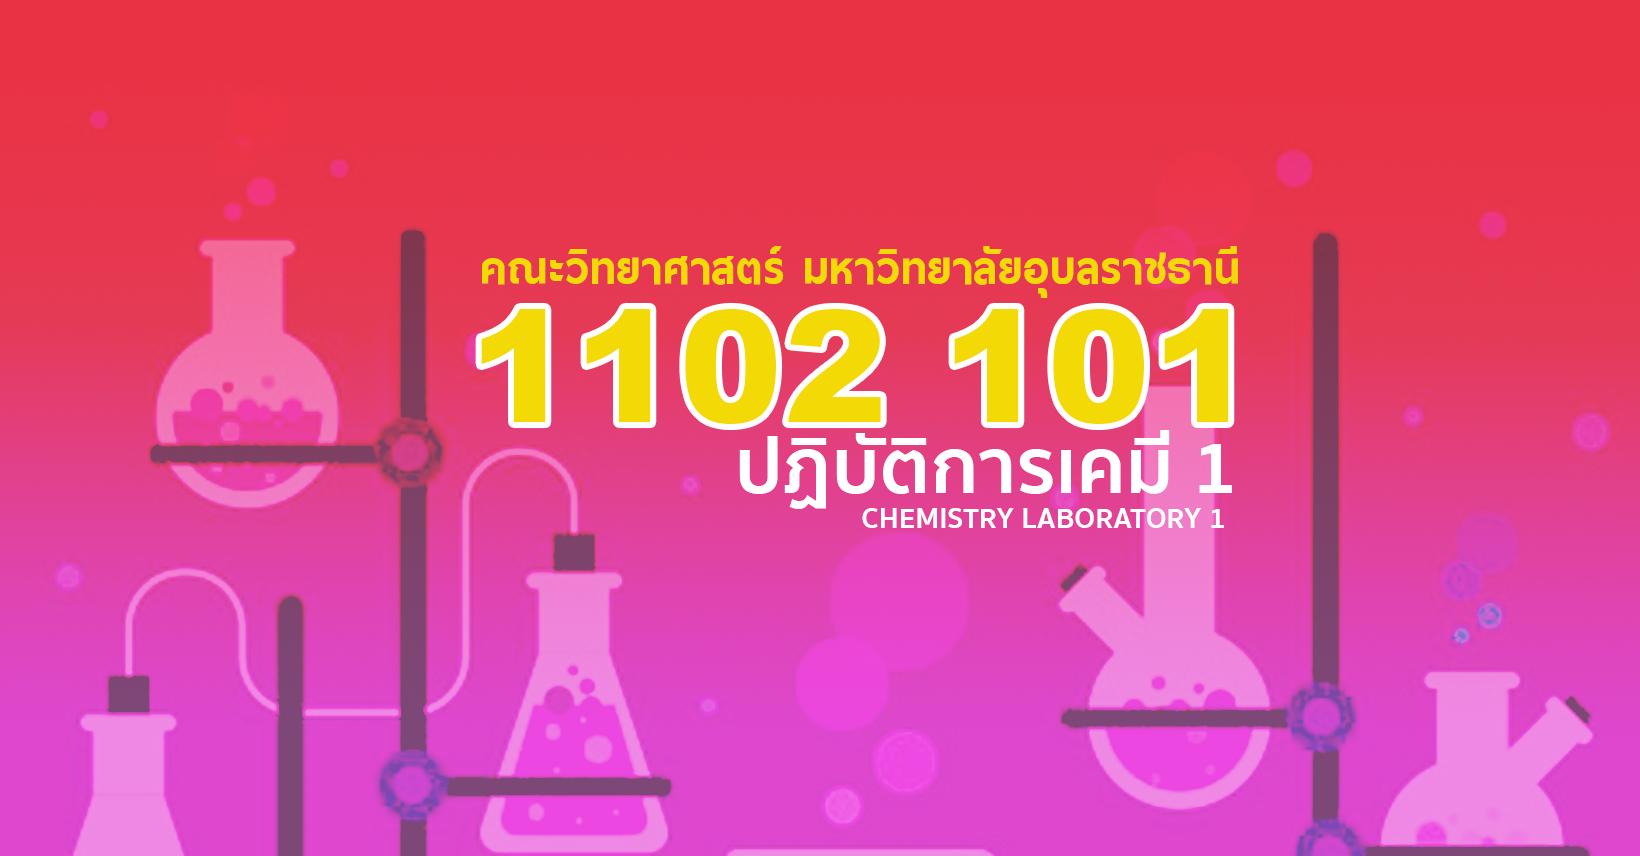 1102101 Chemistry Laboratory I